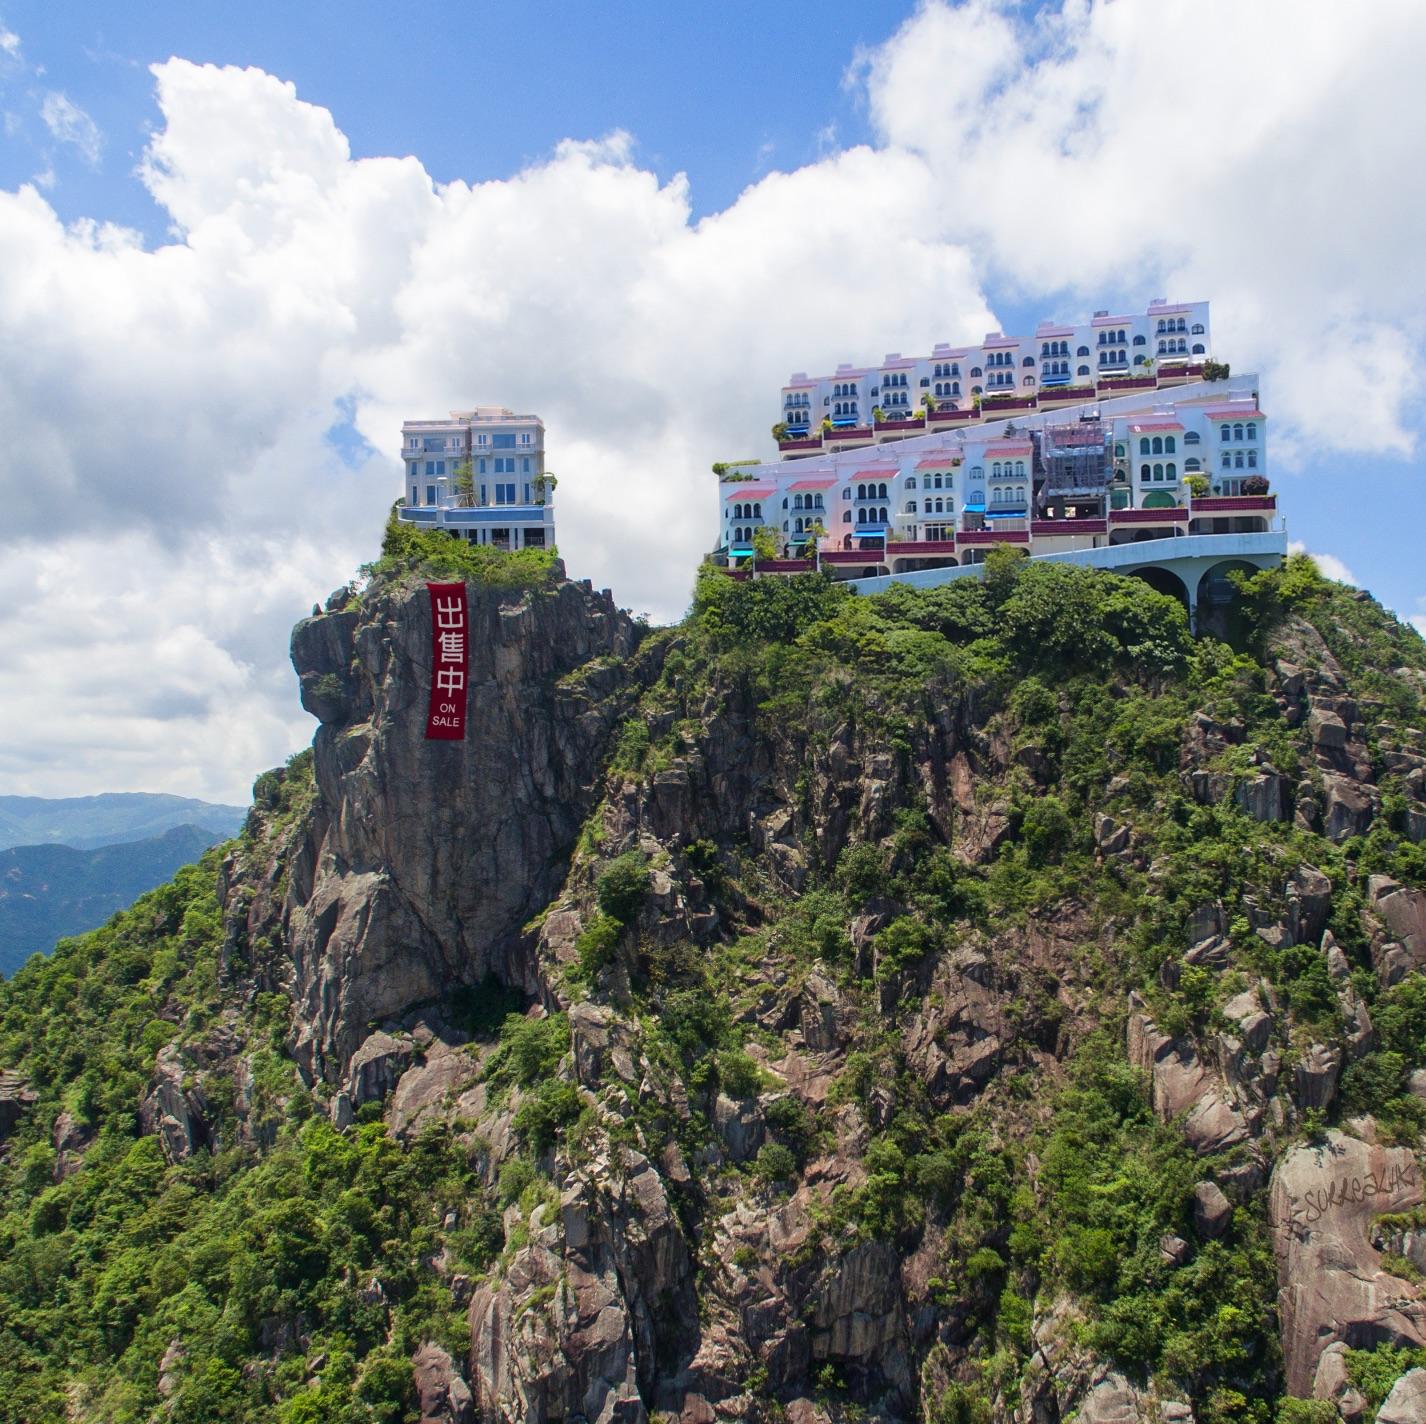 surrealhk Tommy Fung Photoshop 改圖 攝影 個展 獅子山 樓盤